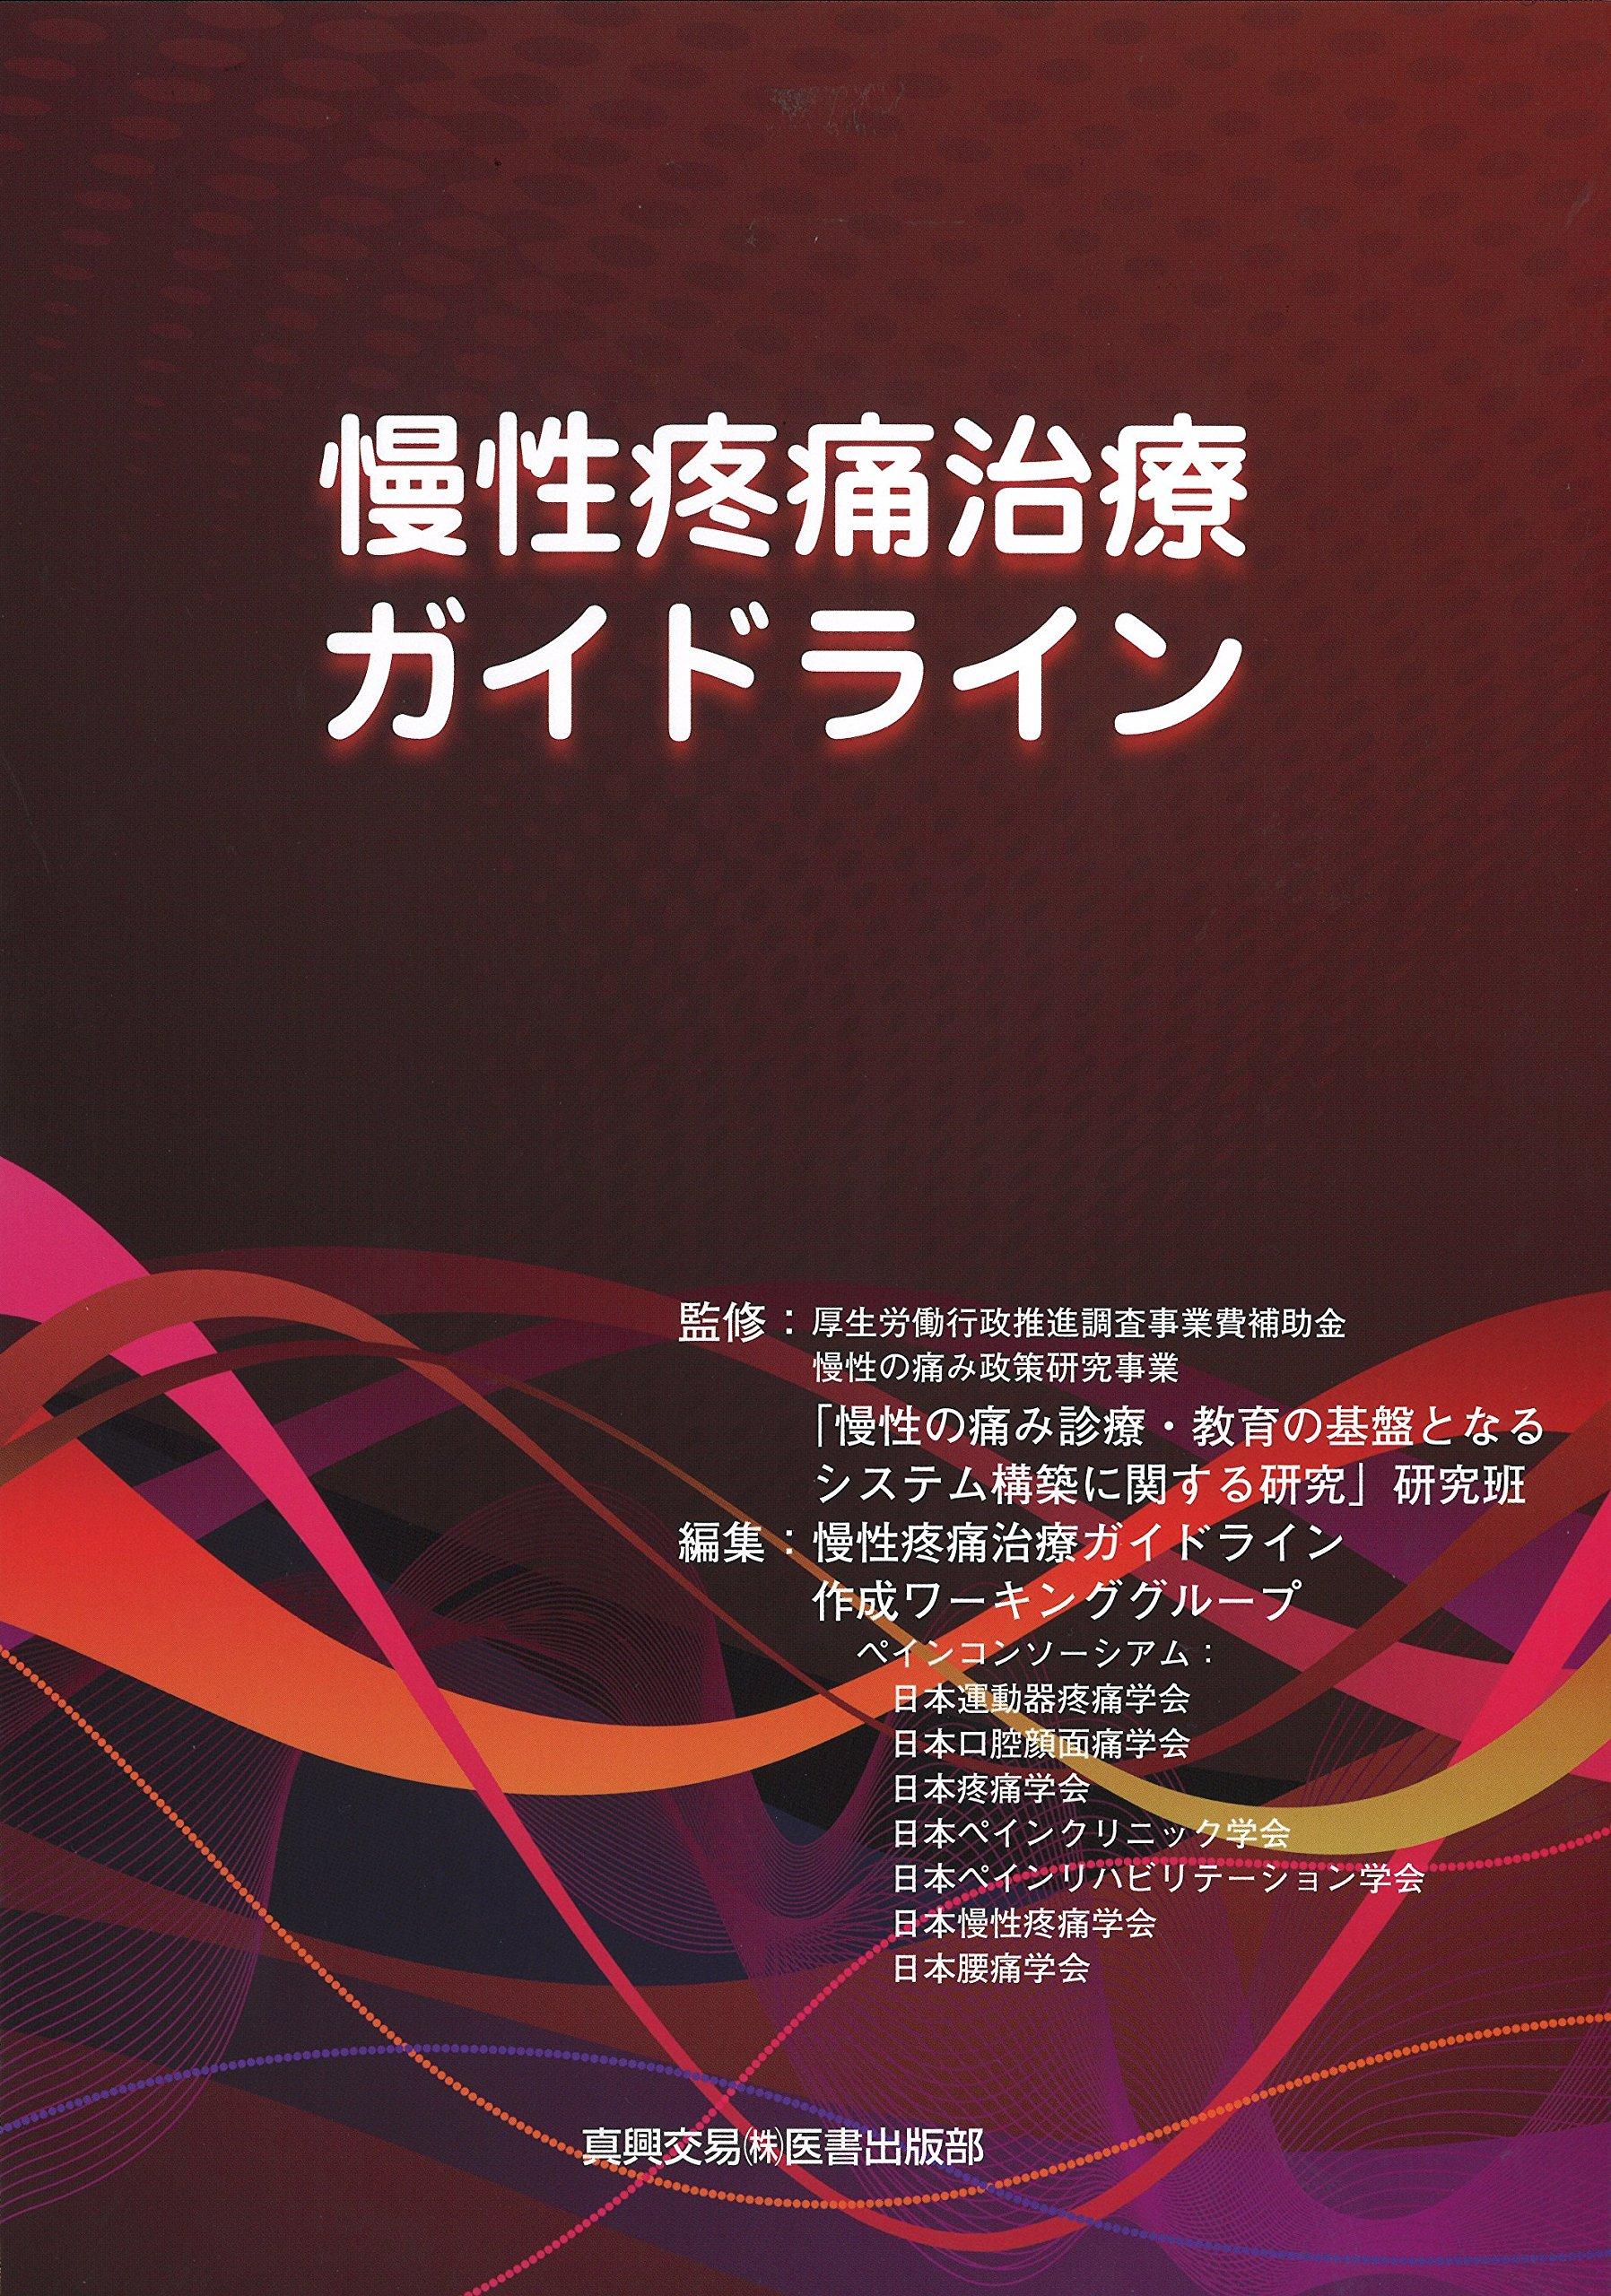 Amazon.co.jp: 慢性疼痛治療ガイドライン: 慢性疼痛治療ガイドライン ...